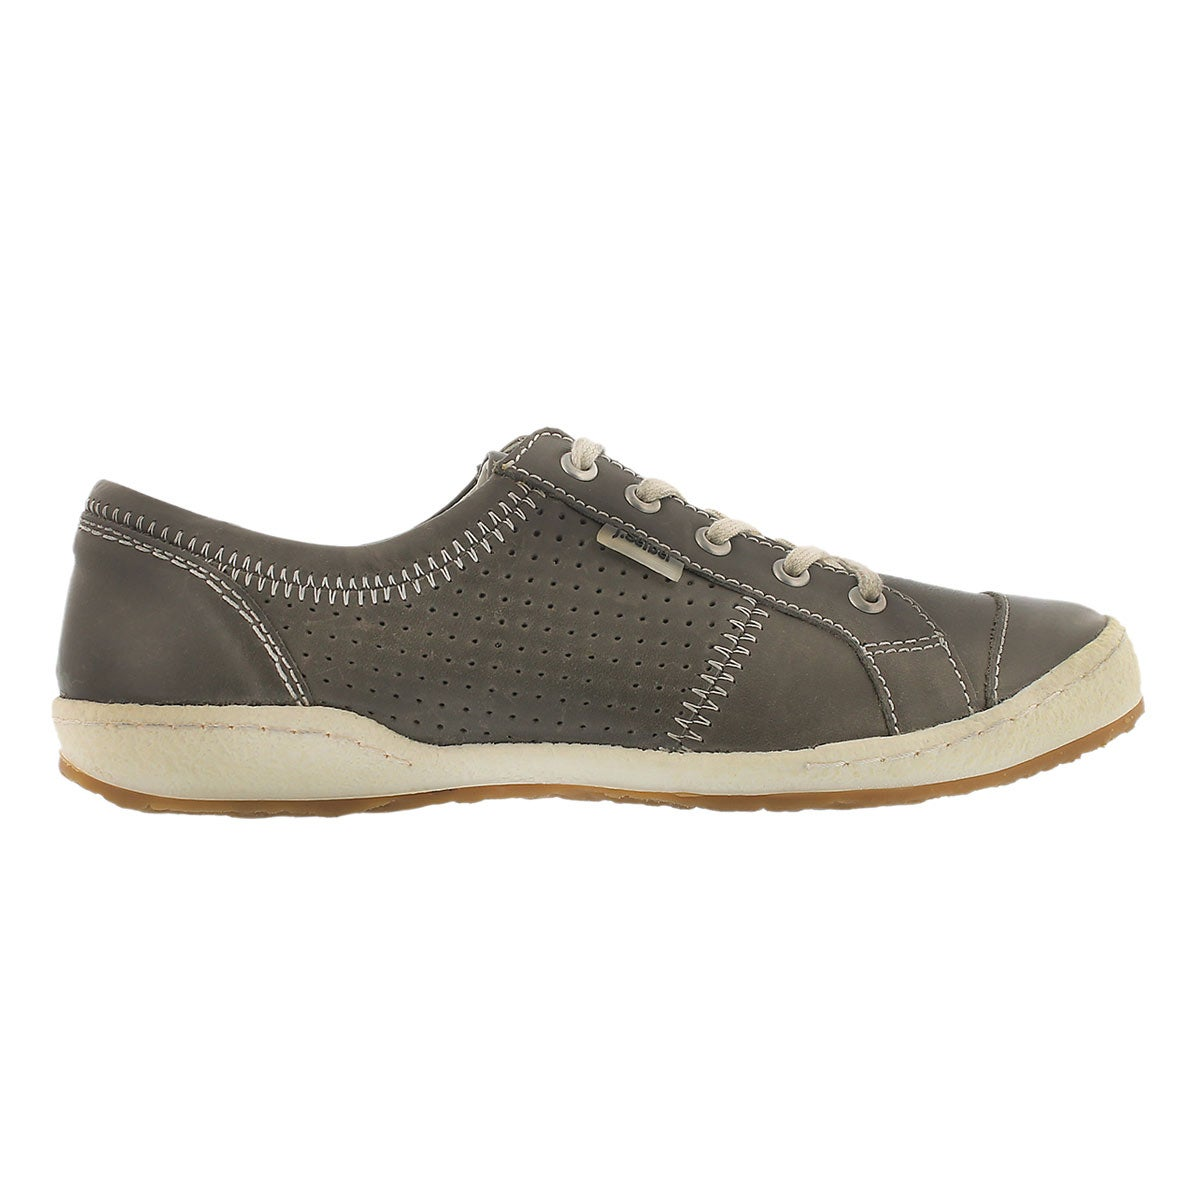 Lds Caspian grigio lace up shoe